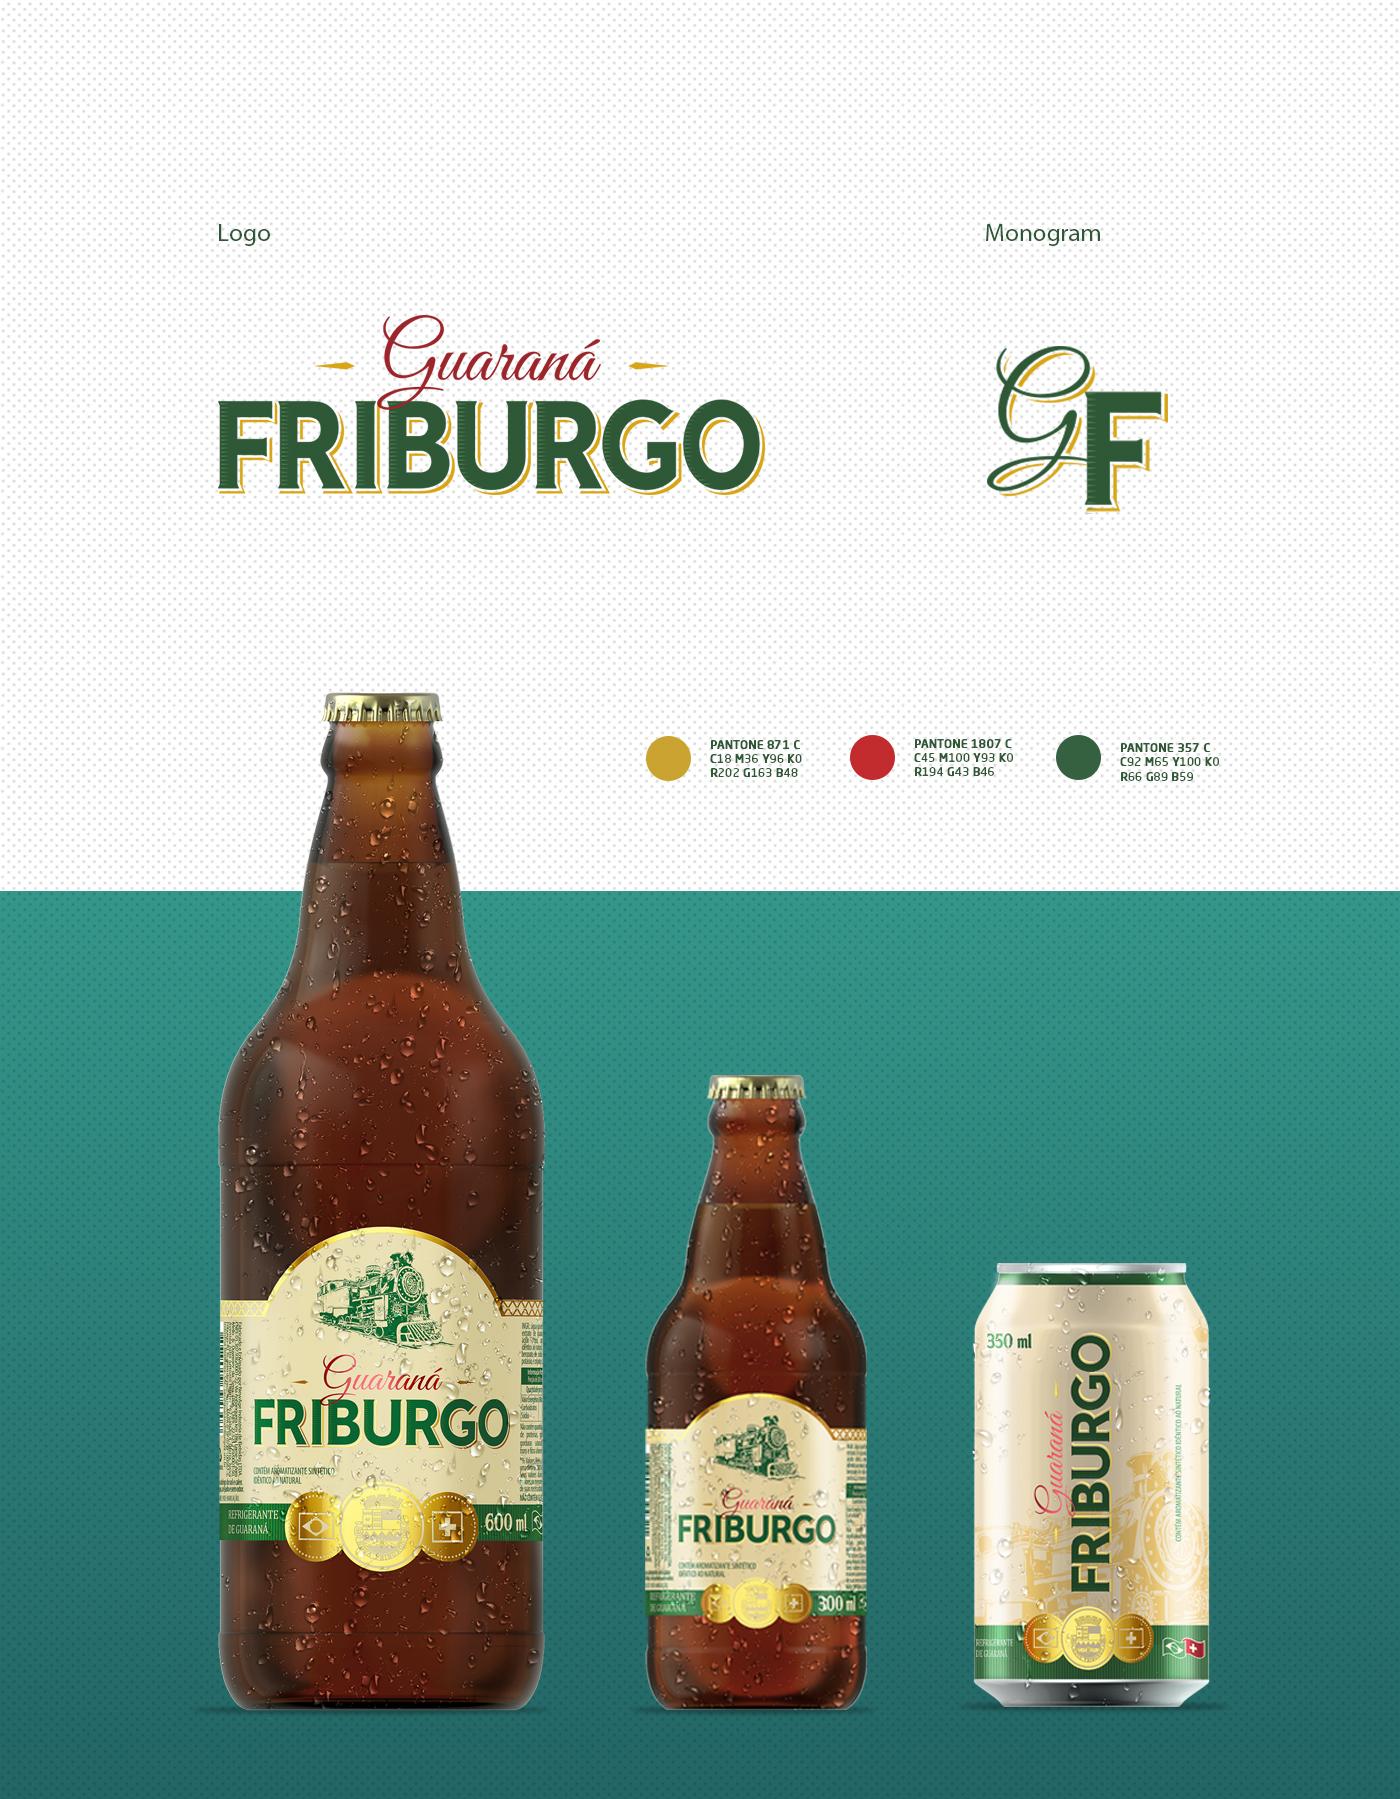 Logotipo Monograma embalagens refrigerante guaraná